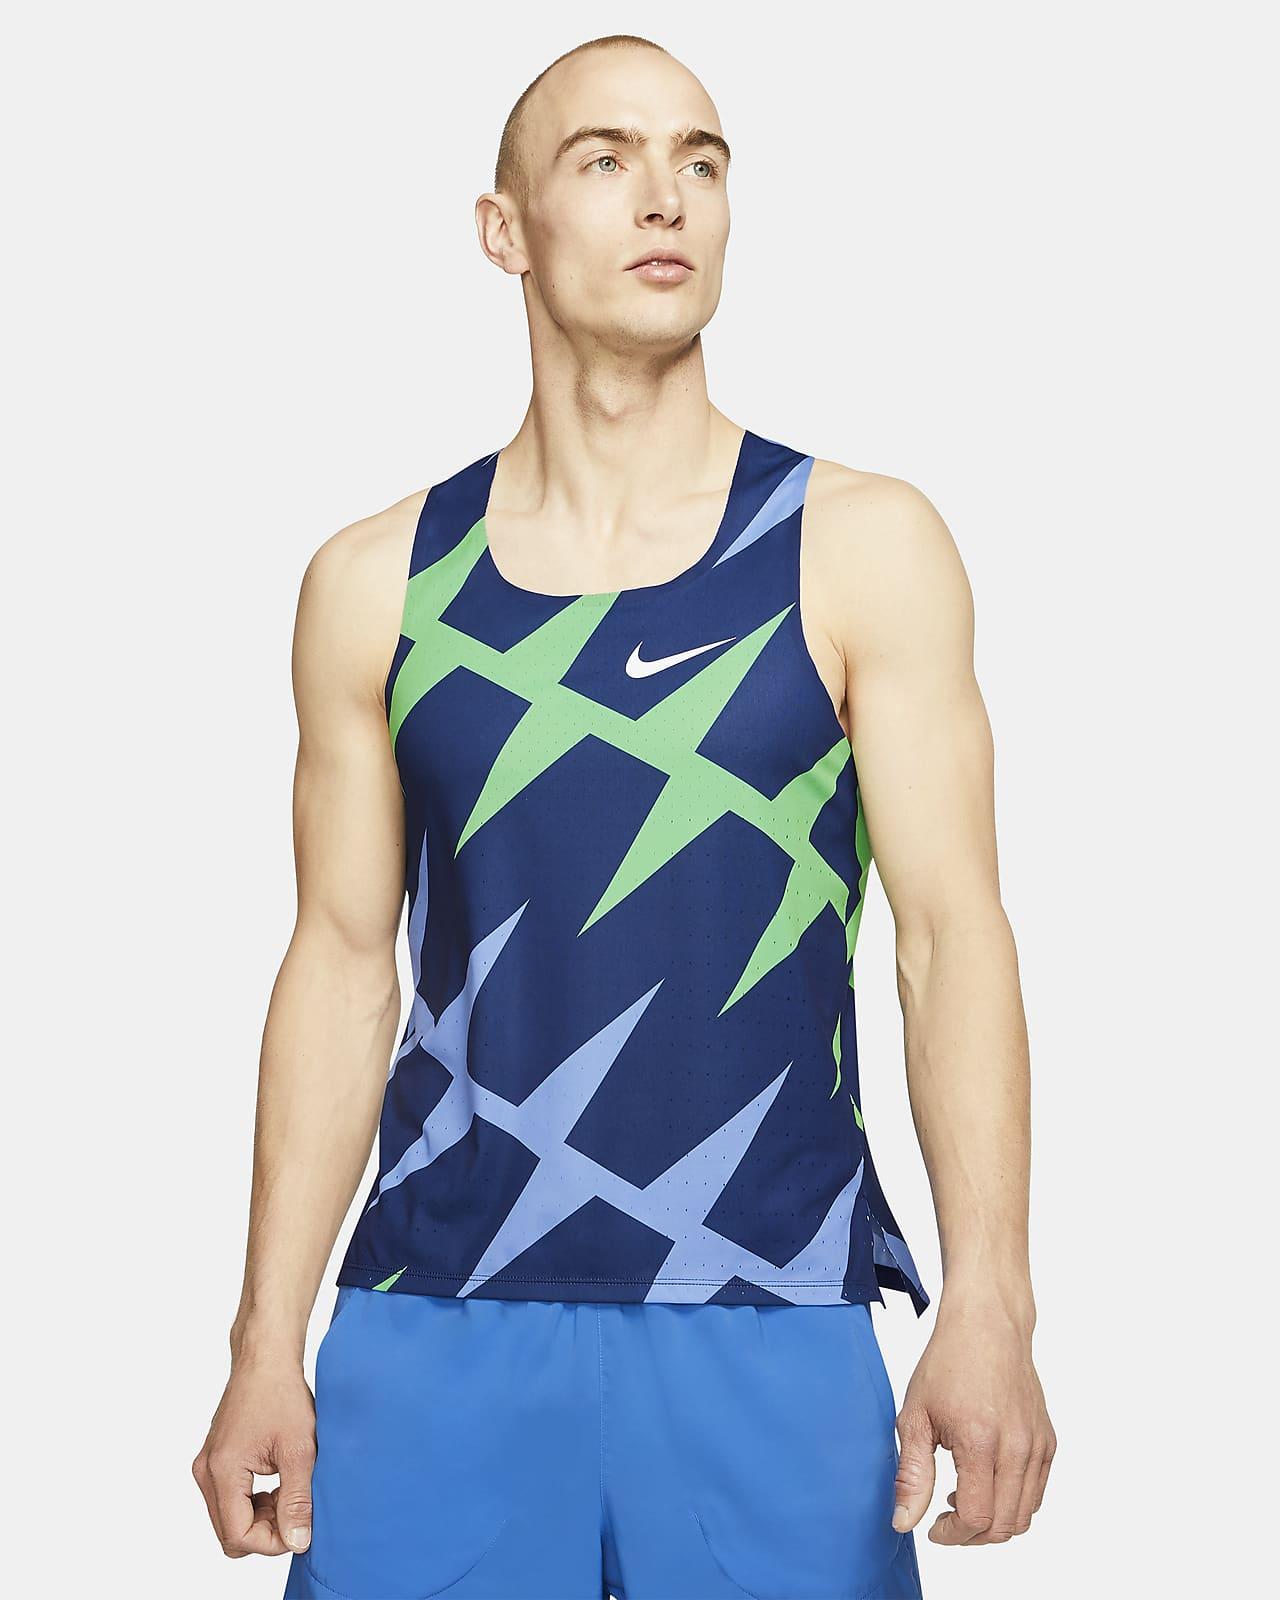 Pánské běžecké tílko Nike AeroSwift